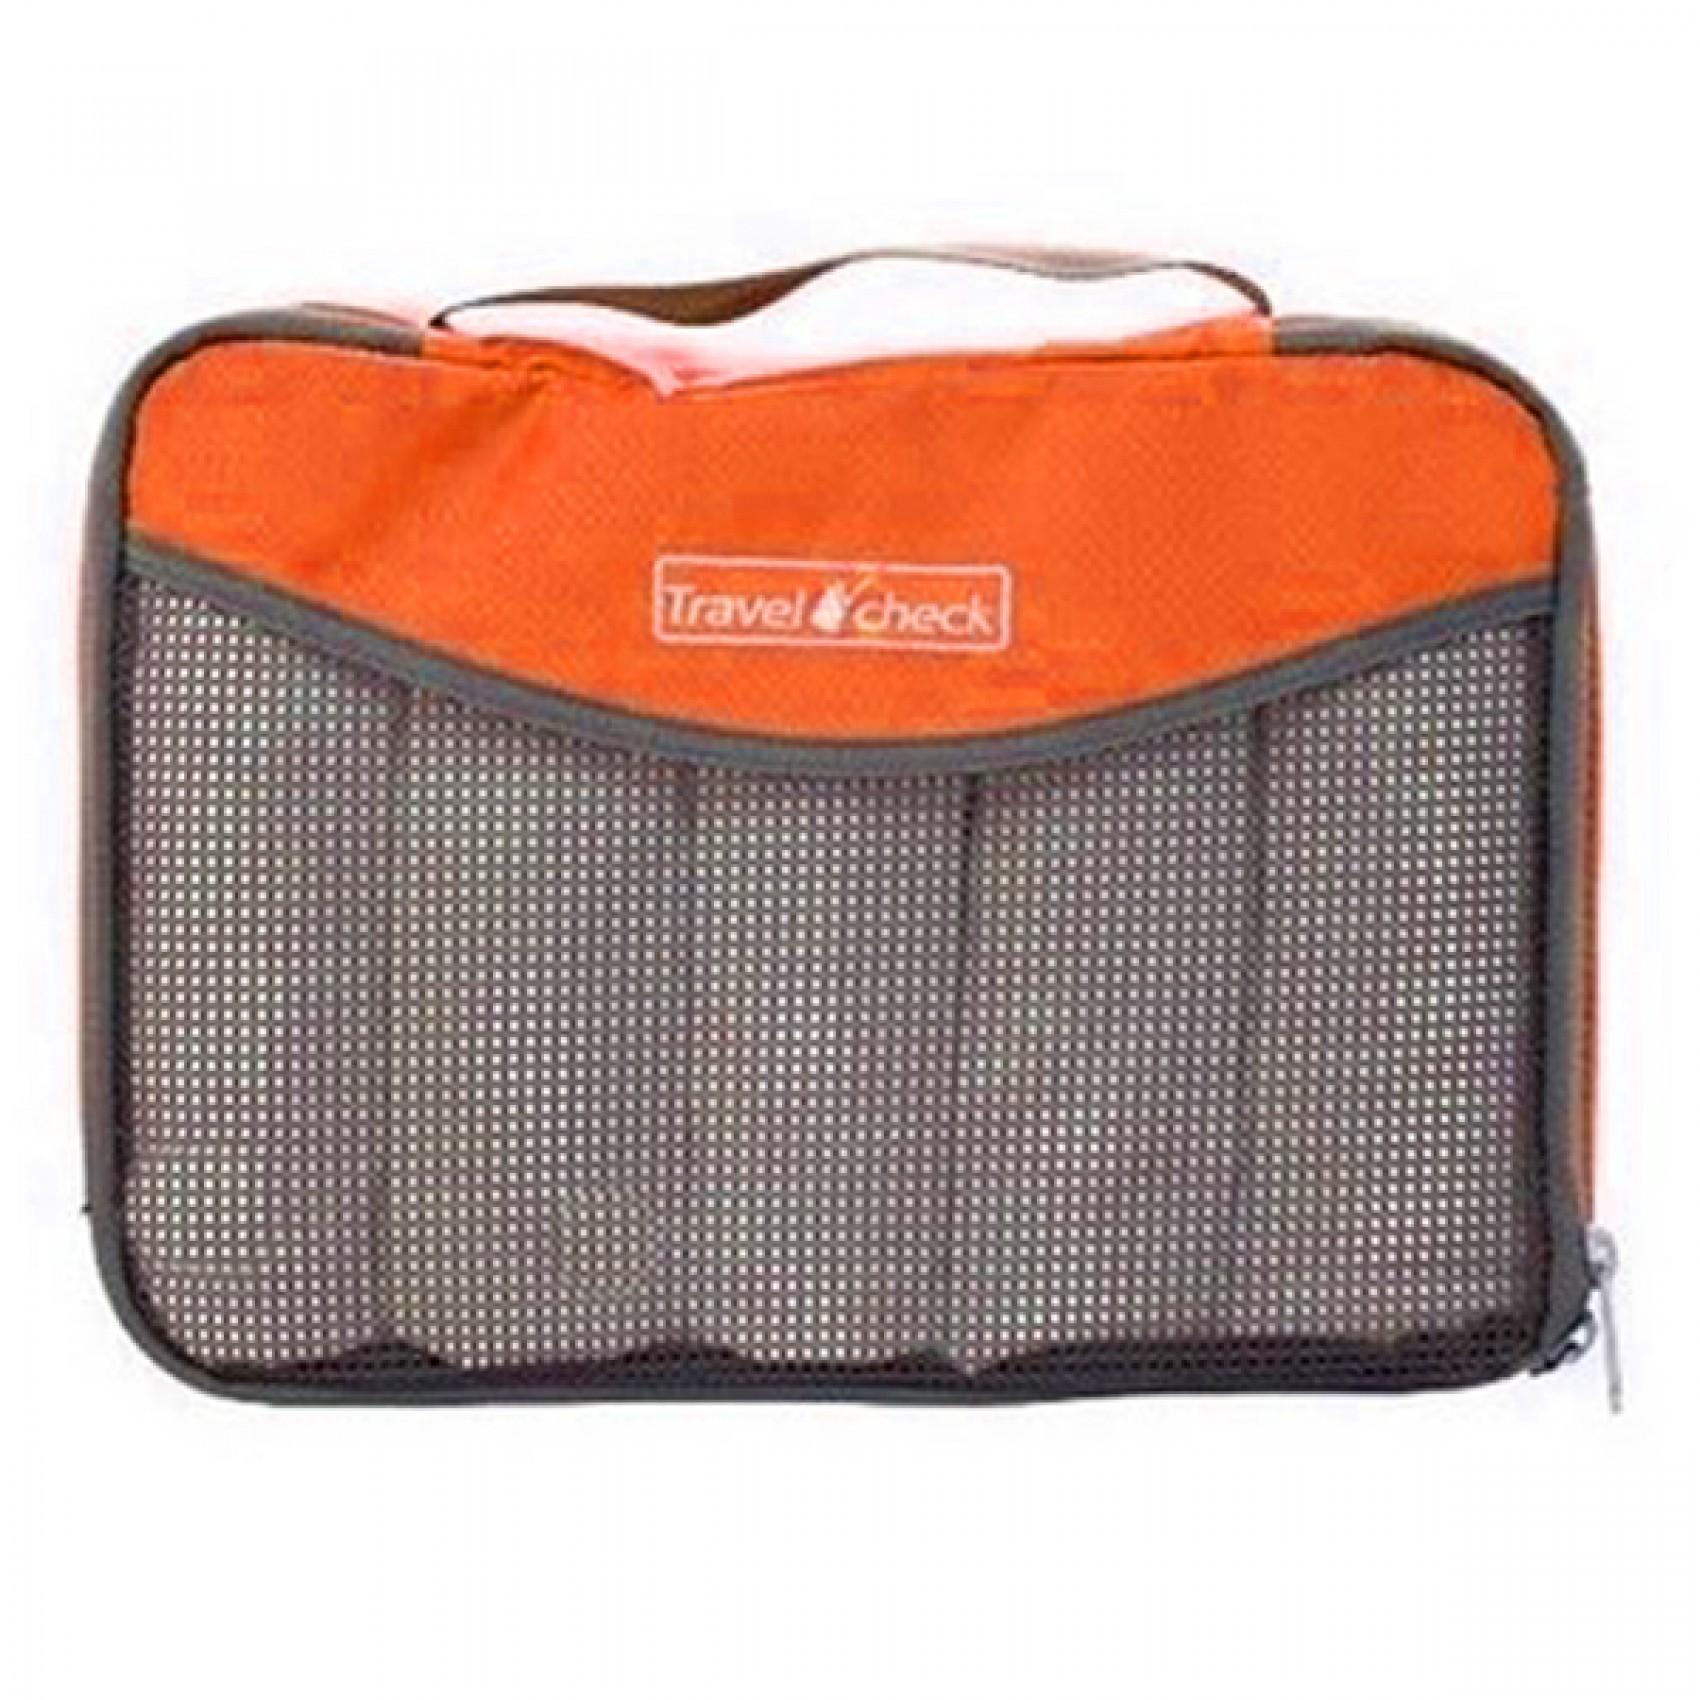 Generic Travel Check Luggage Organizer Bag – Orange (LGGEN00001ORG-3429)